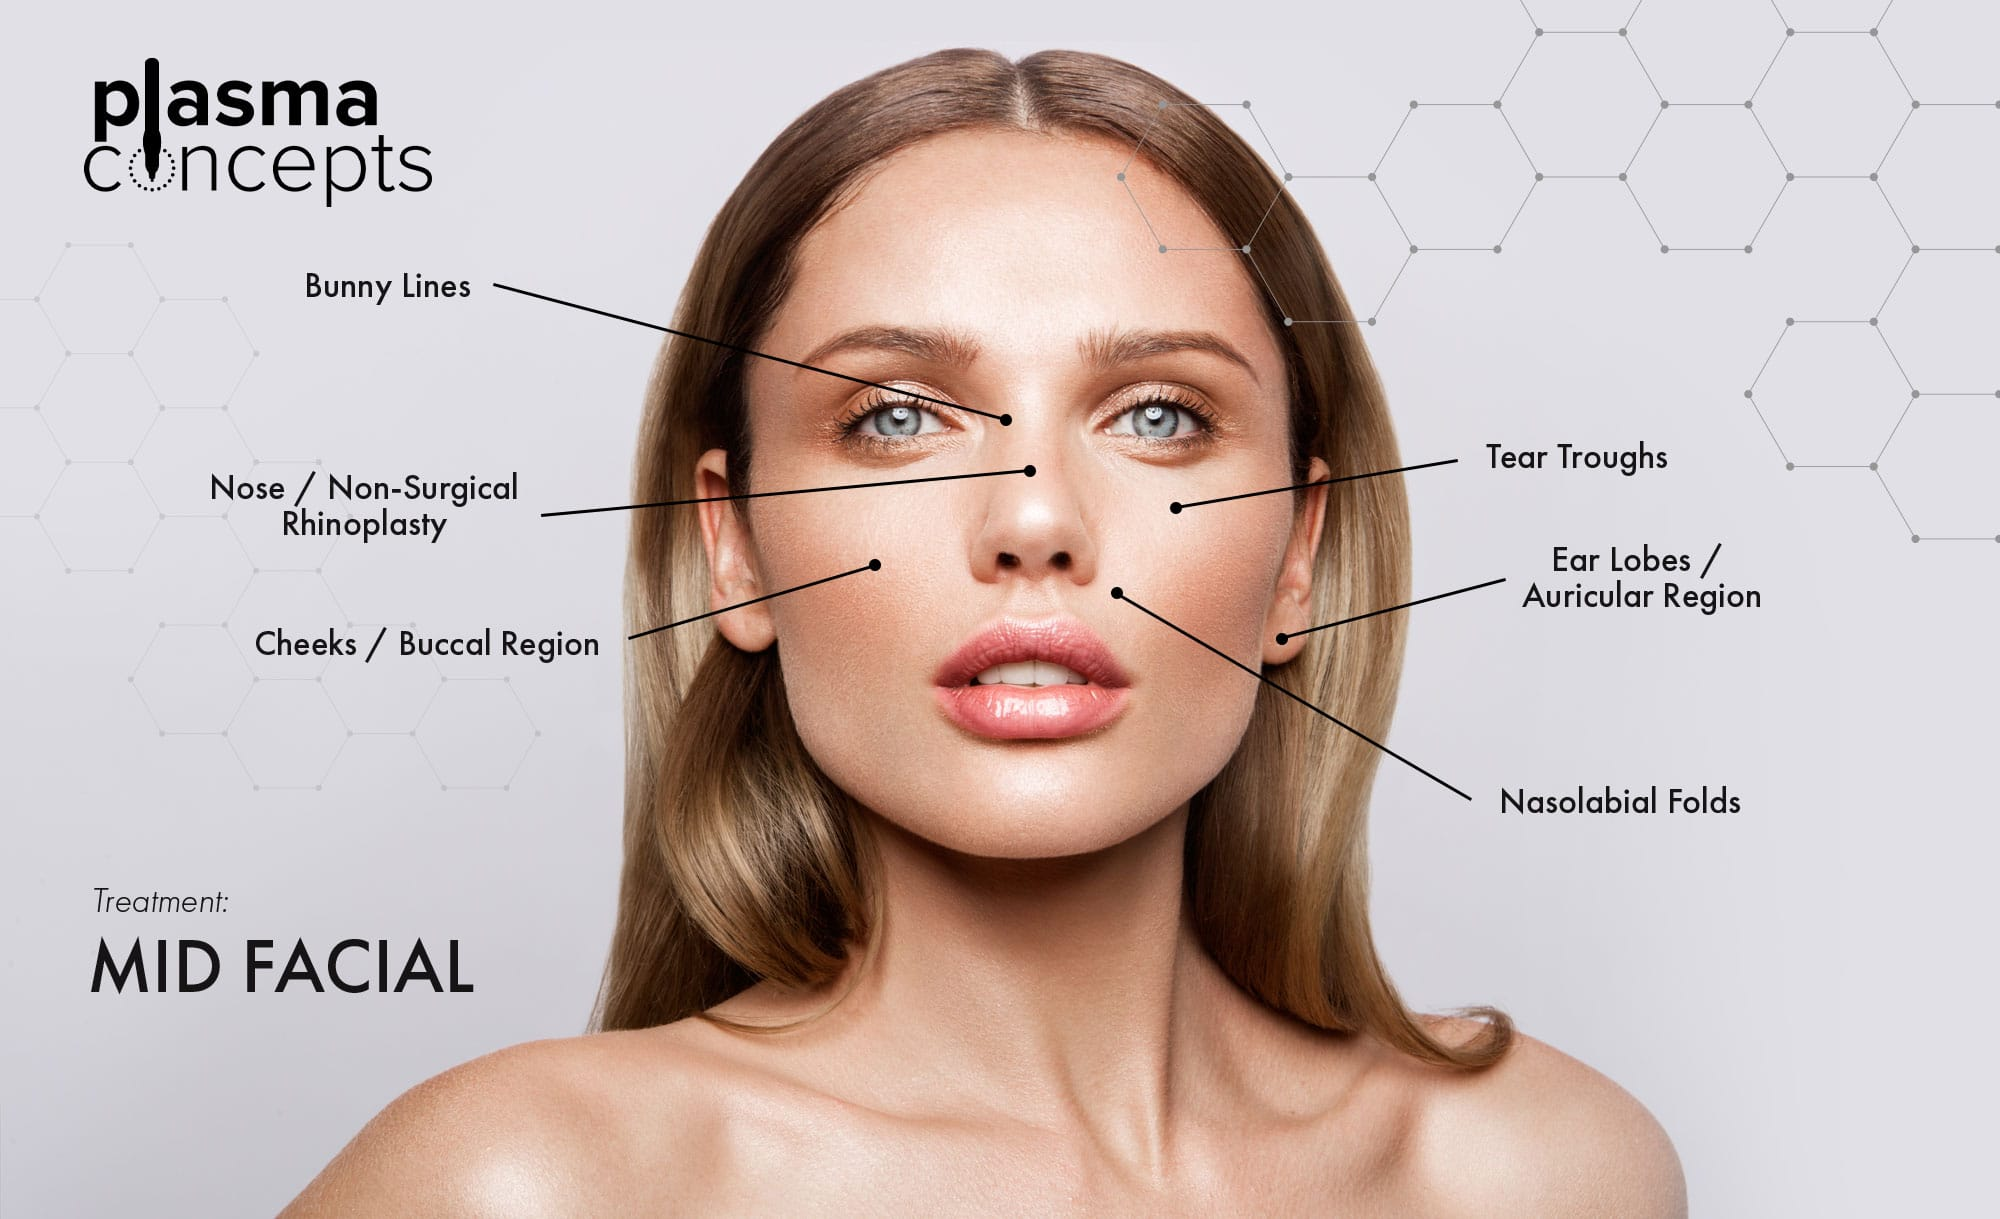 Gainesville Mid Facial Treatment Guide The Plasma Concepts Pen